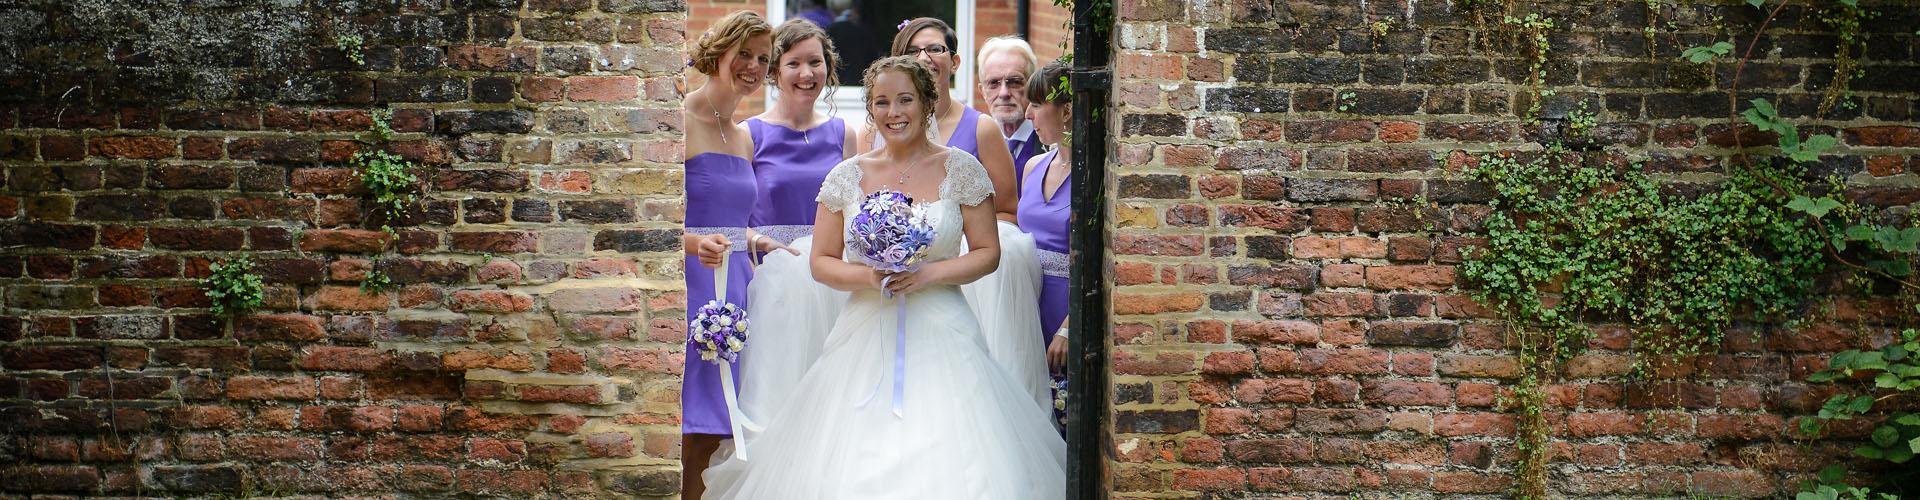 wedding_photographer_london_4